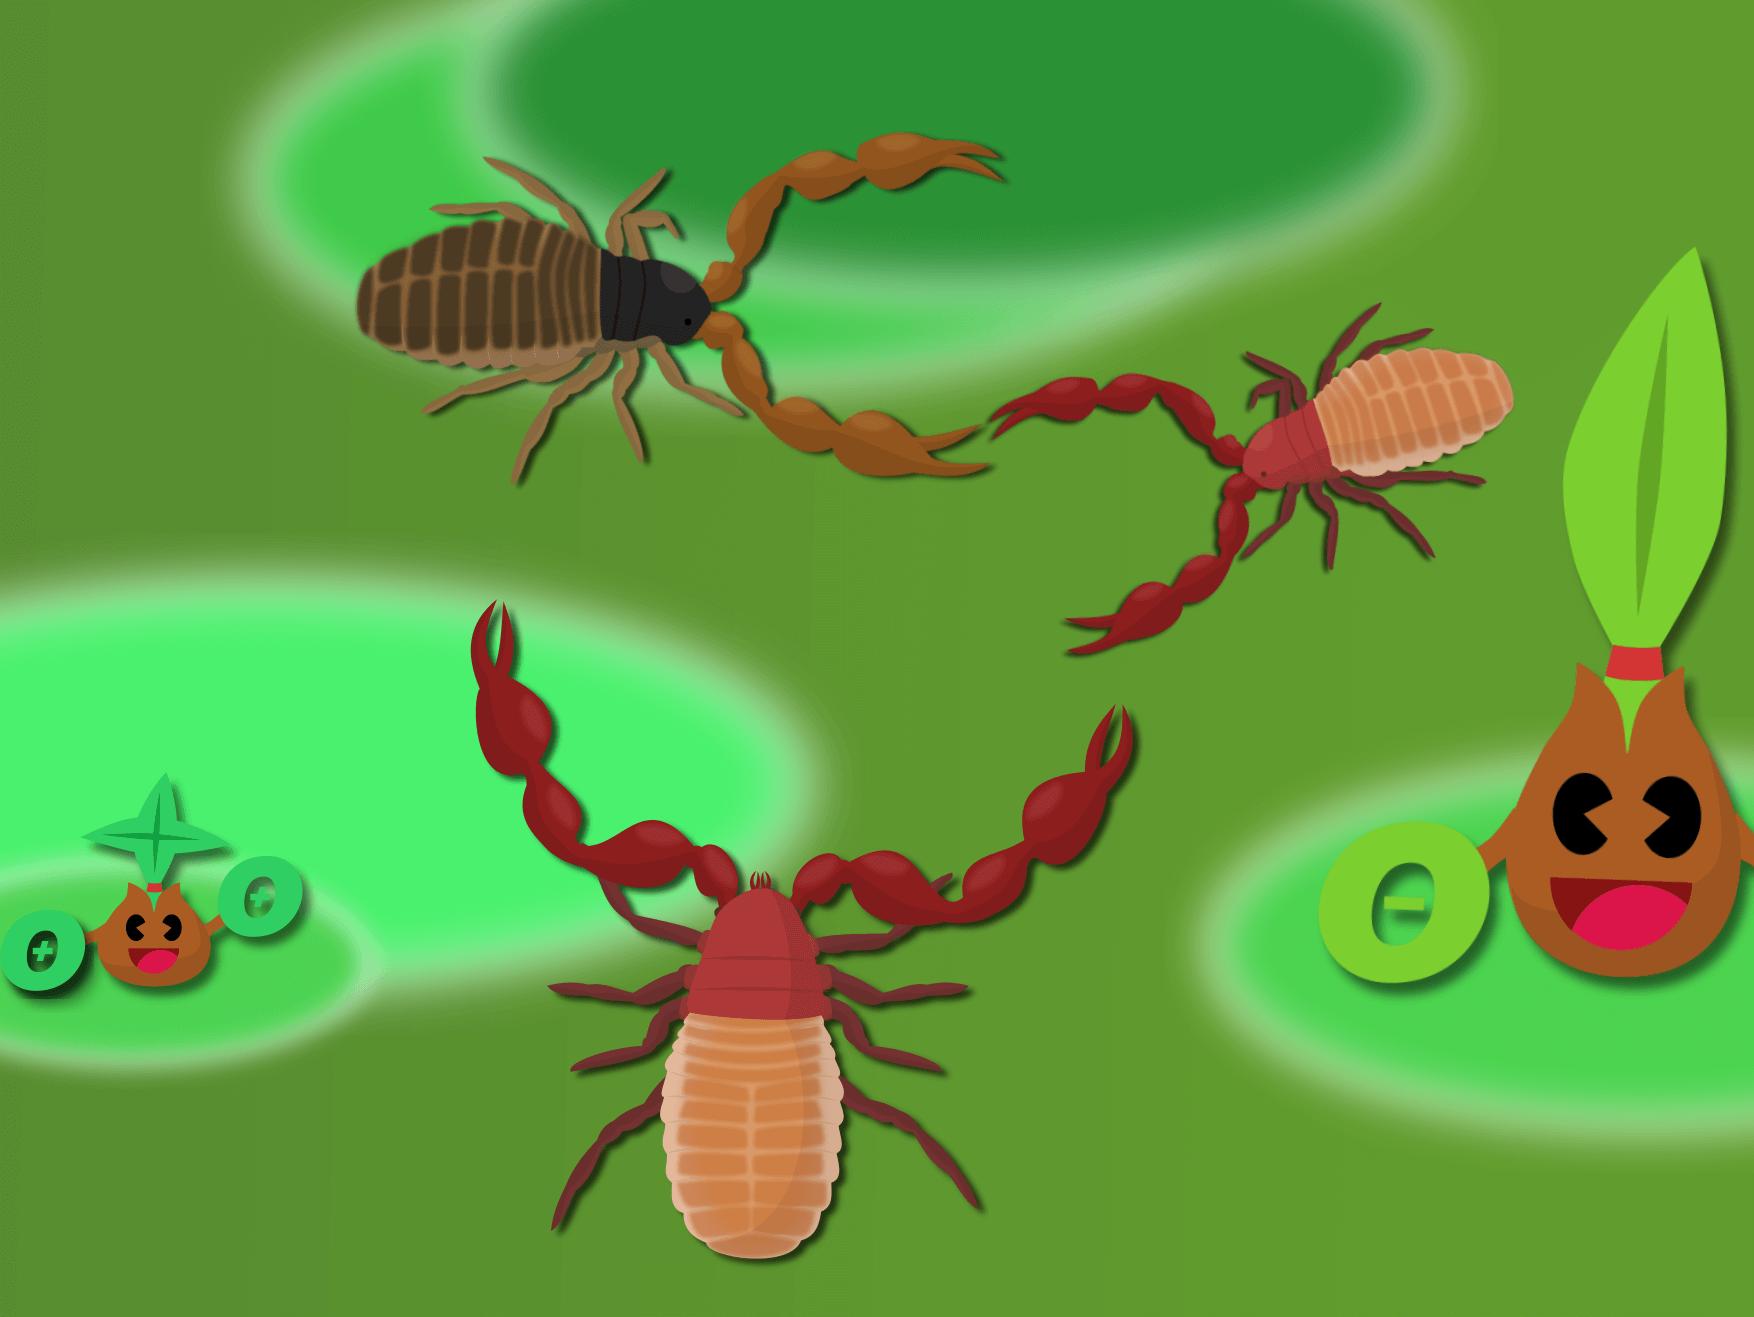 Scorpion femelle datant Scorpion mâle Eli j Finkel rencontres en ligne